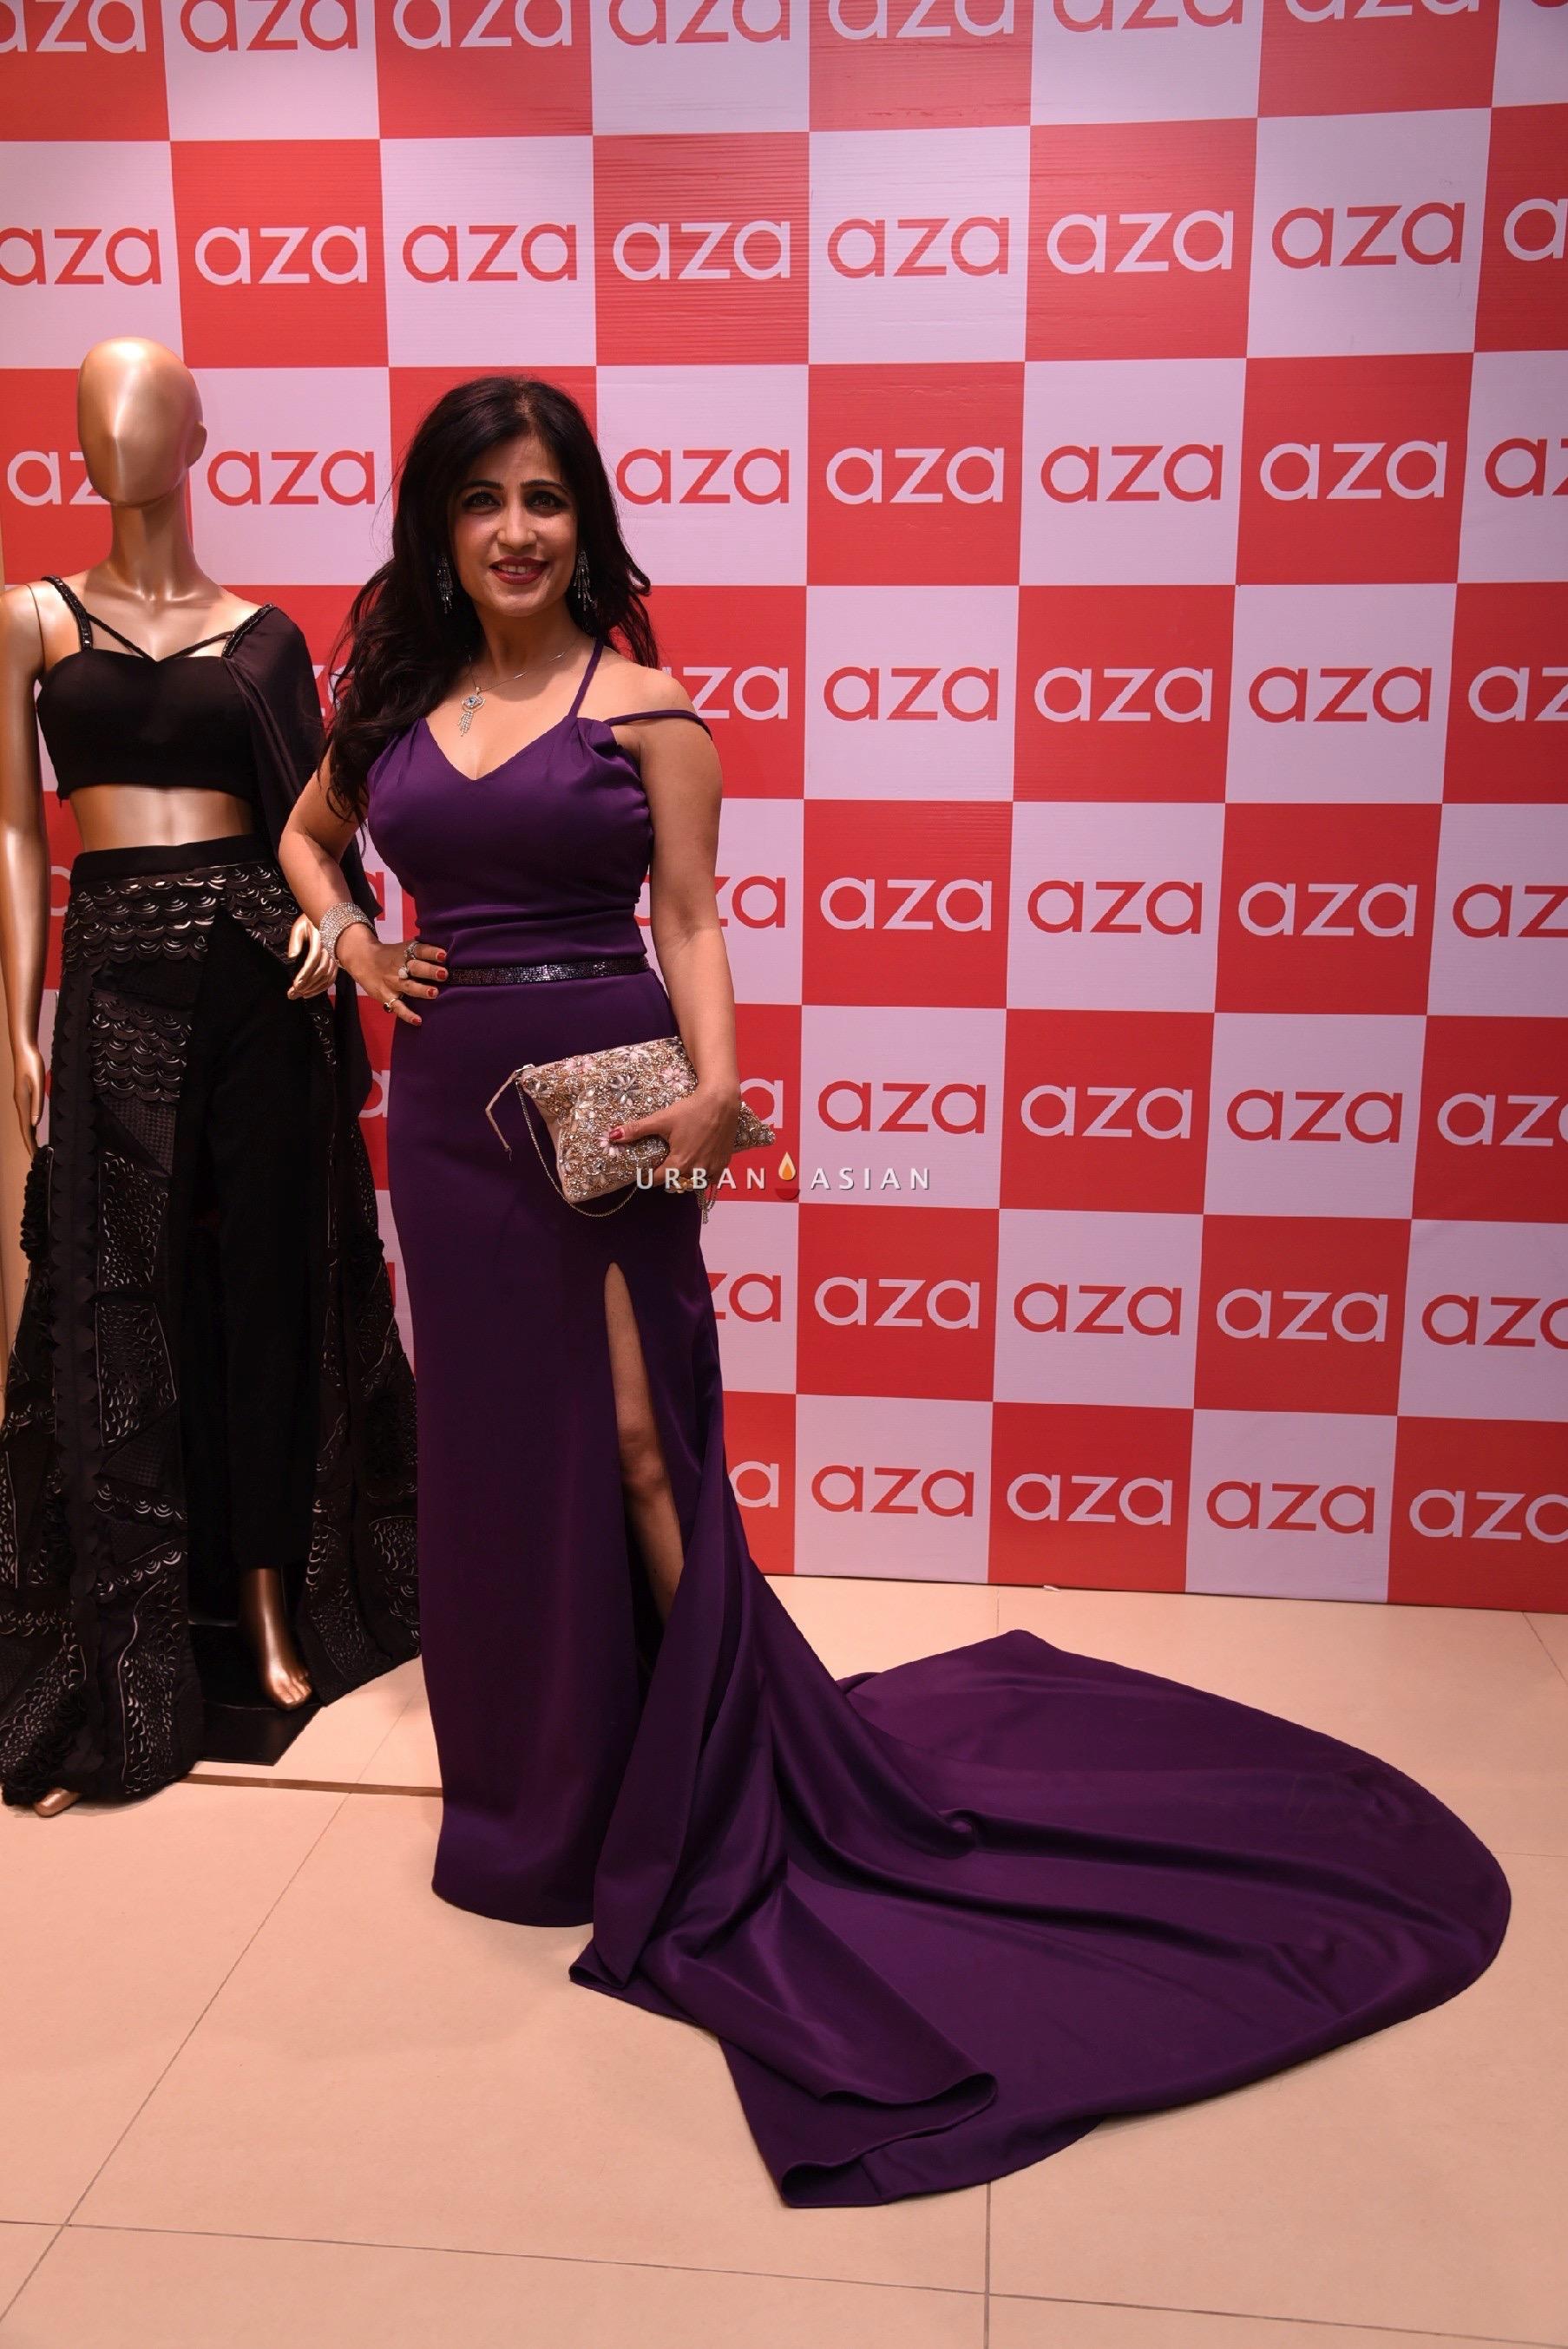 shibani-kashyap-eshaa-amiins-new-party-wear-launch-at-aza